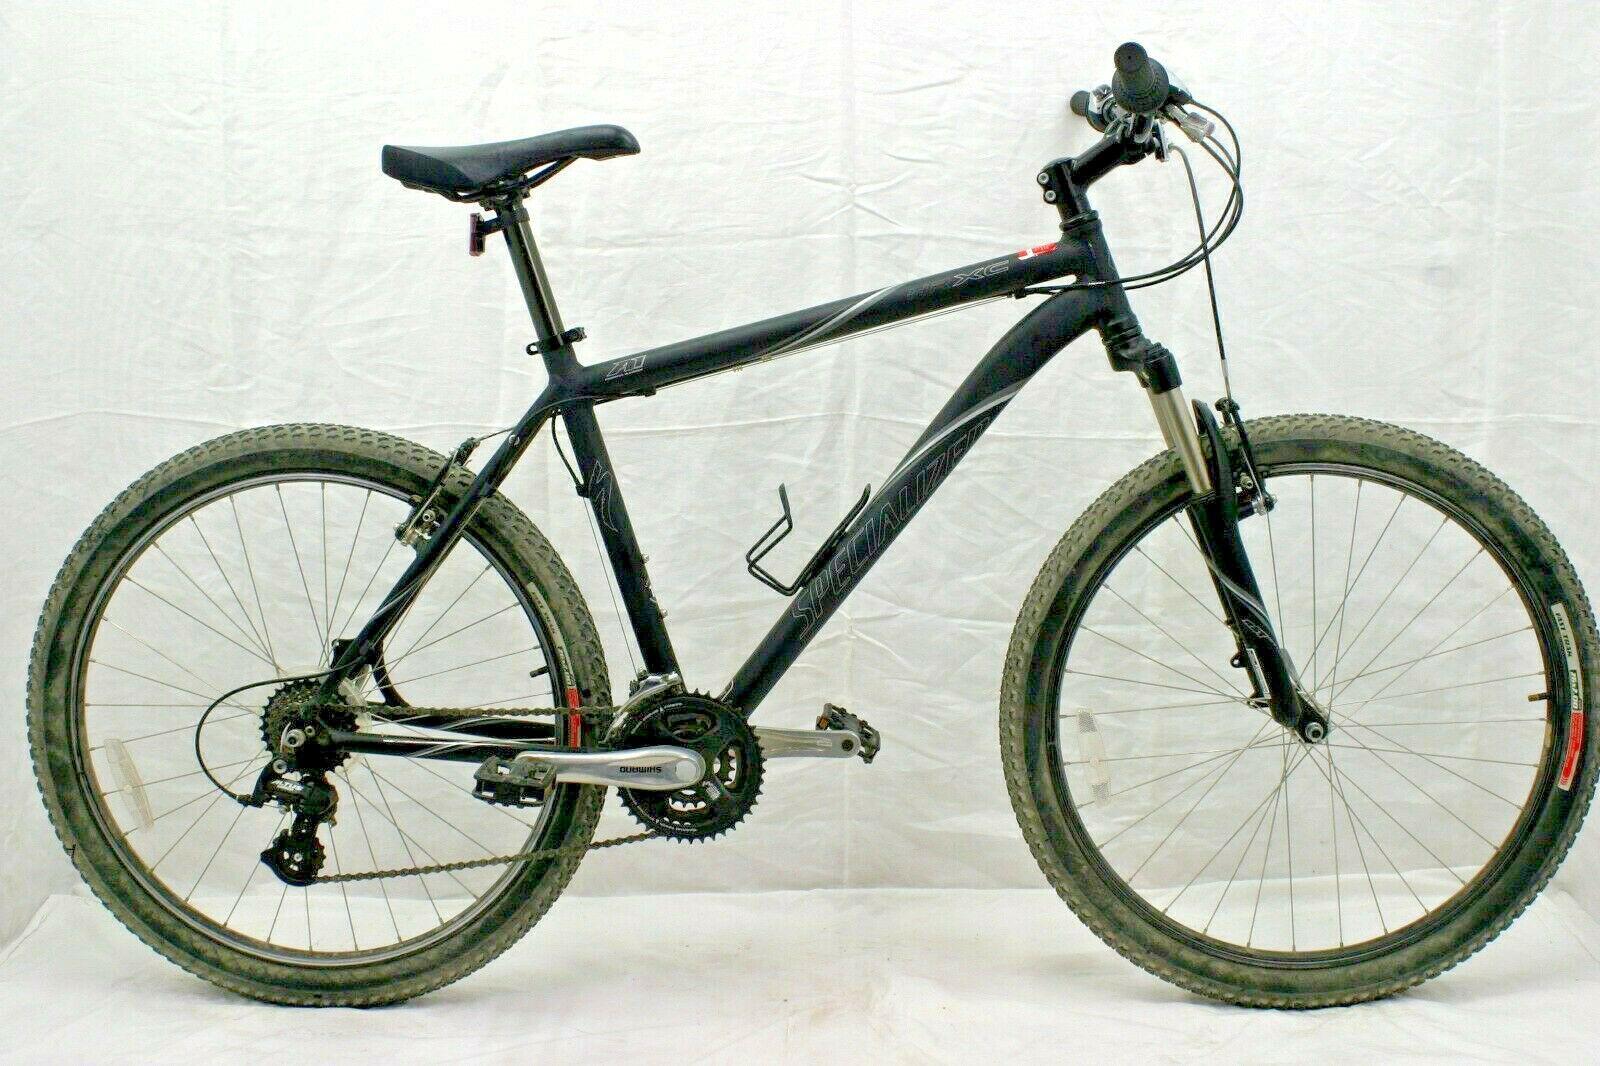 Specialized Hrxc Mountain Bike Mtb L 19 26er Suspension Fork V